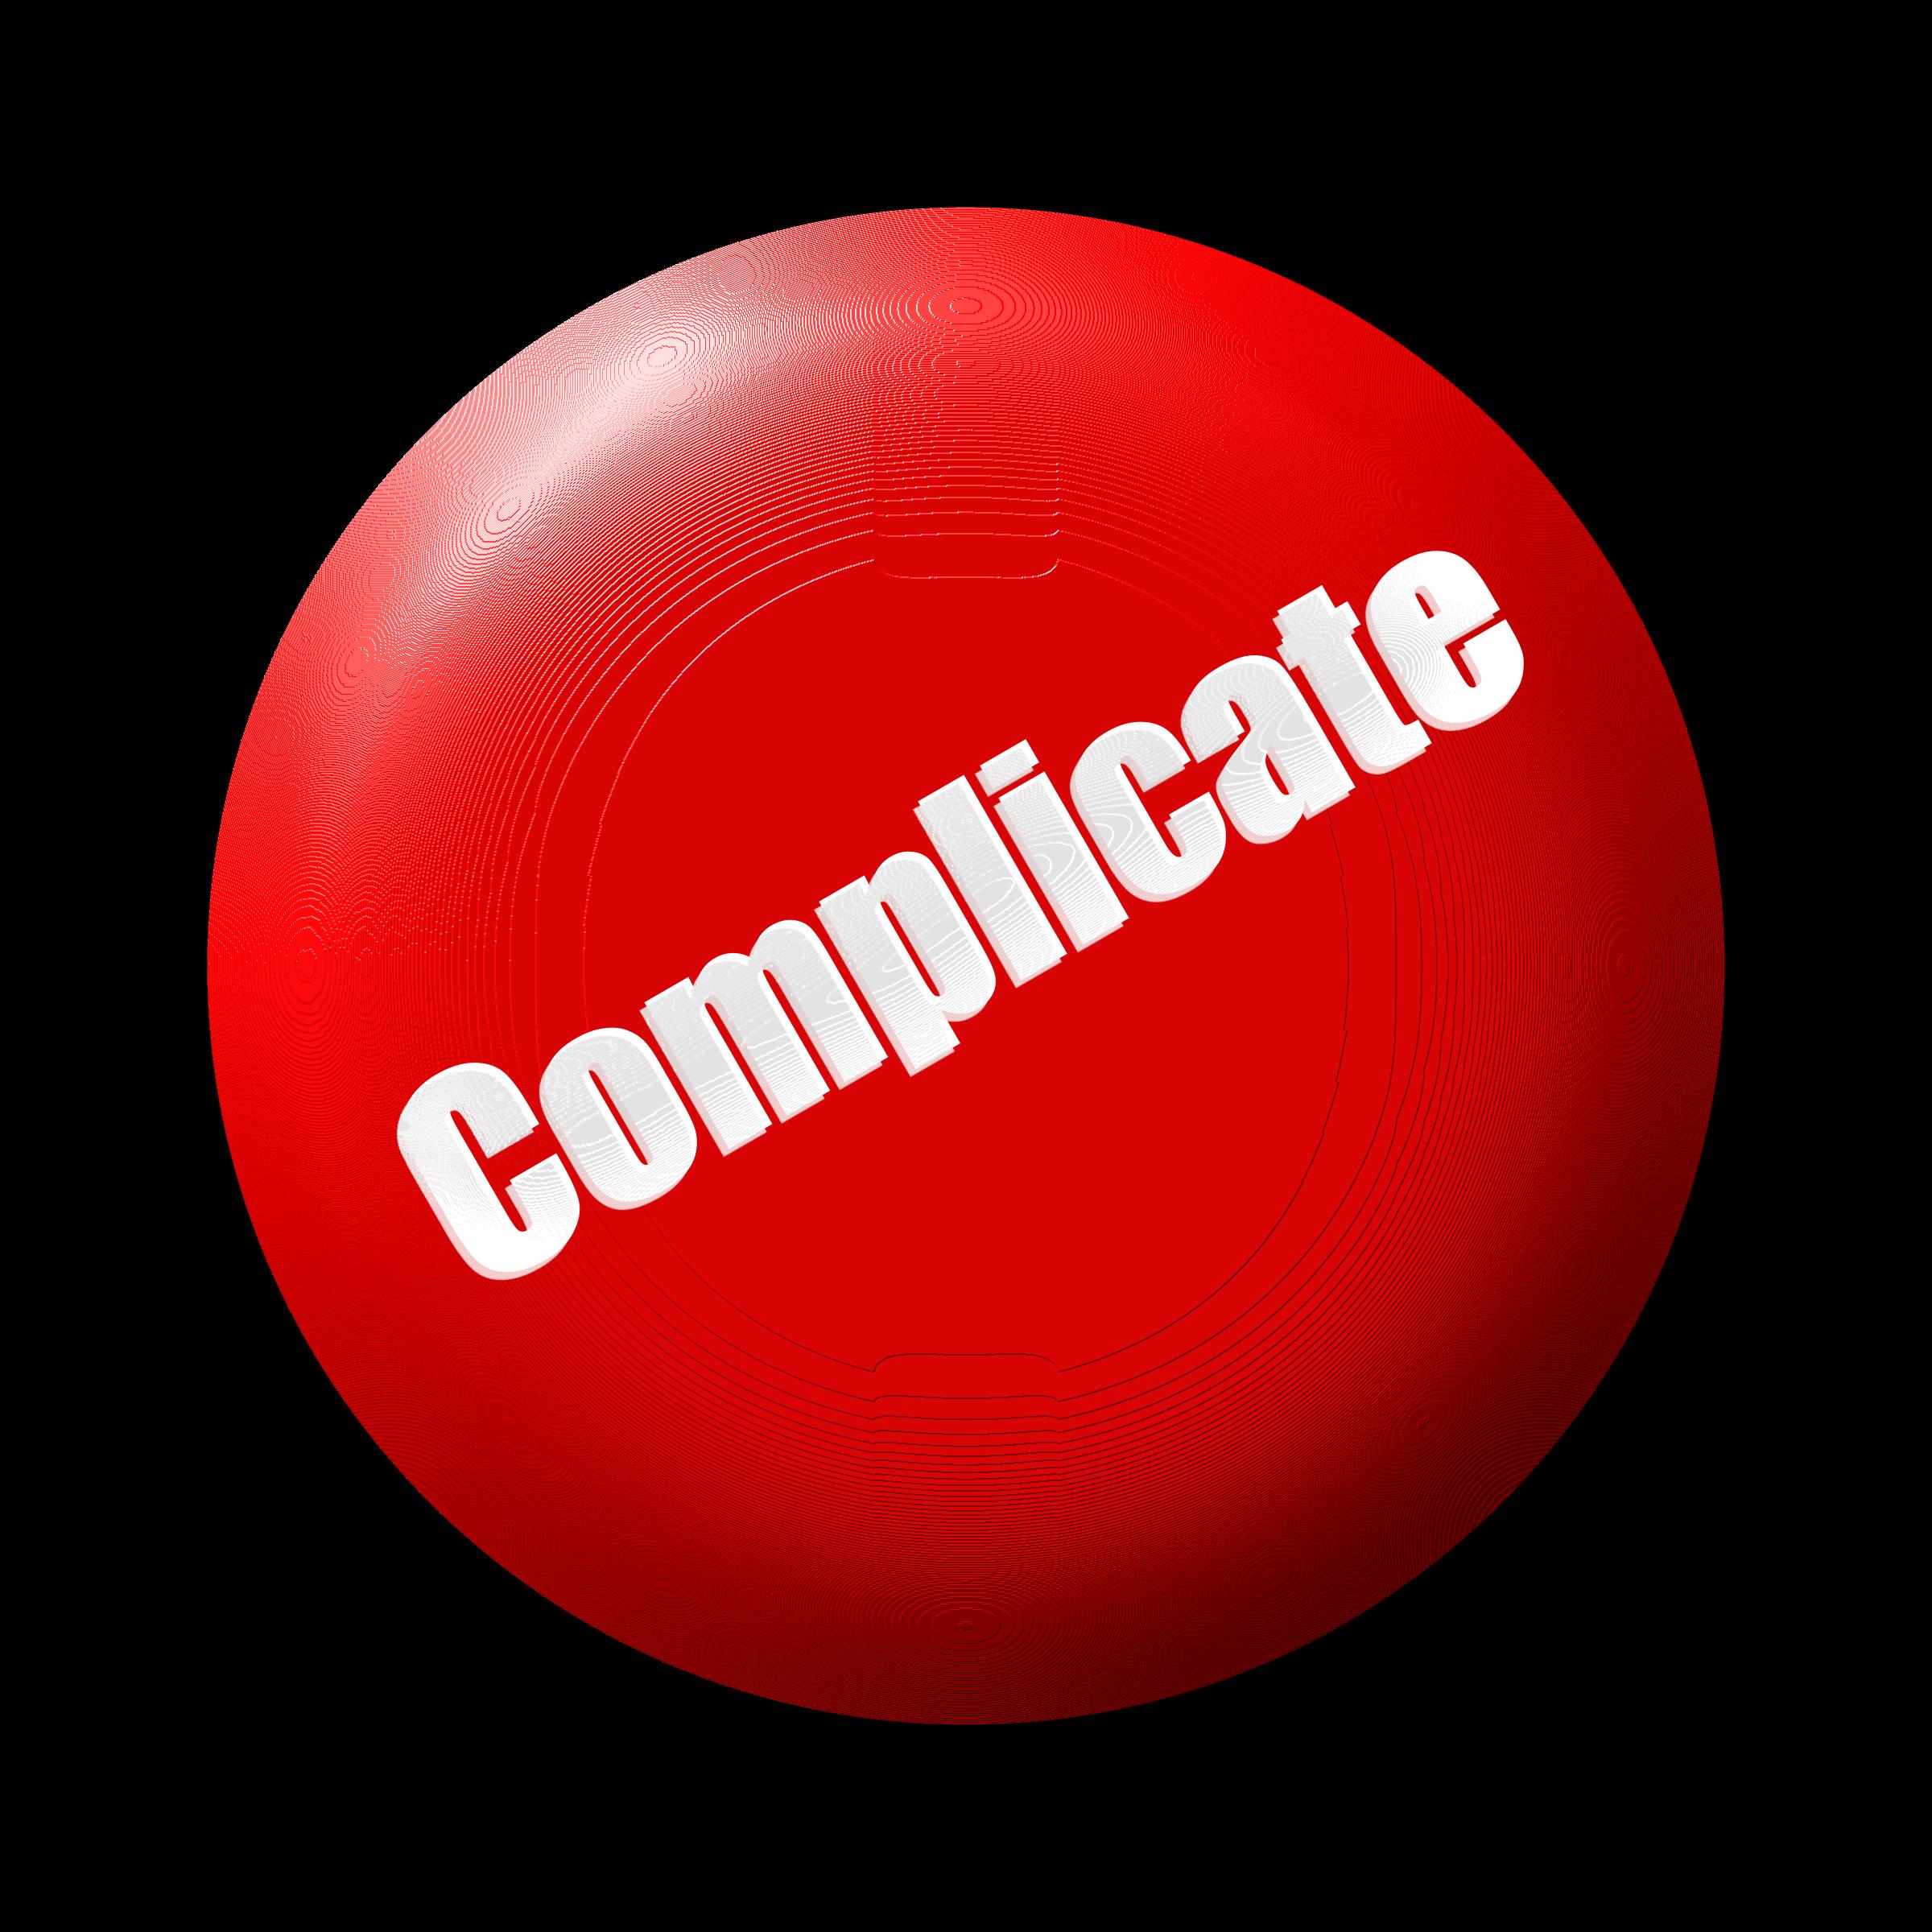 svg library download Clipart complicate button big. Kickball vector.